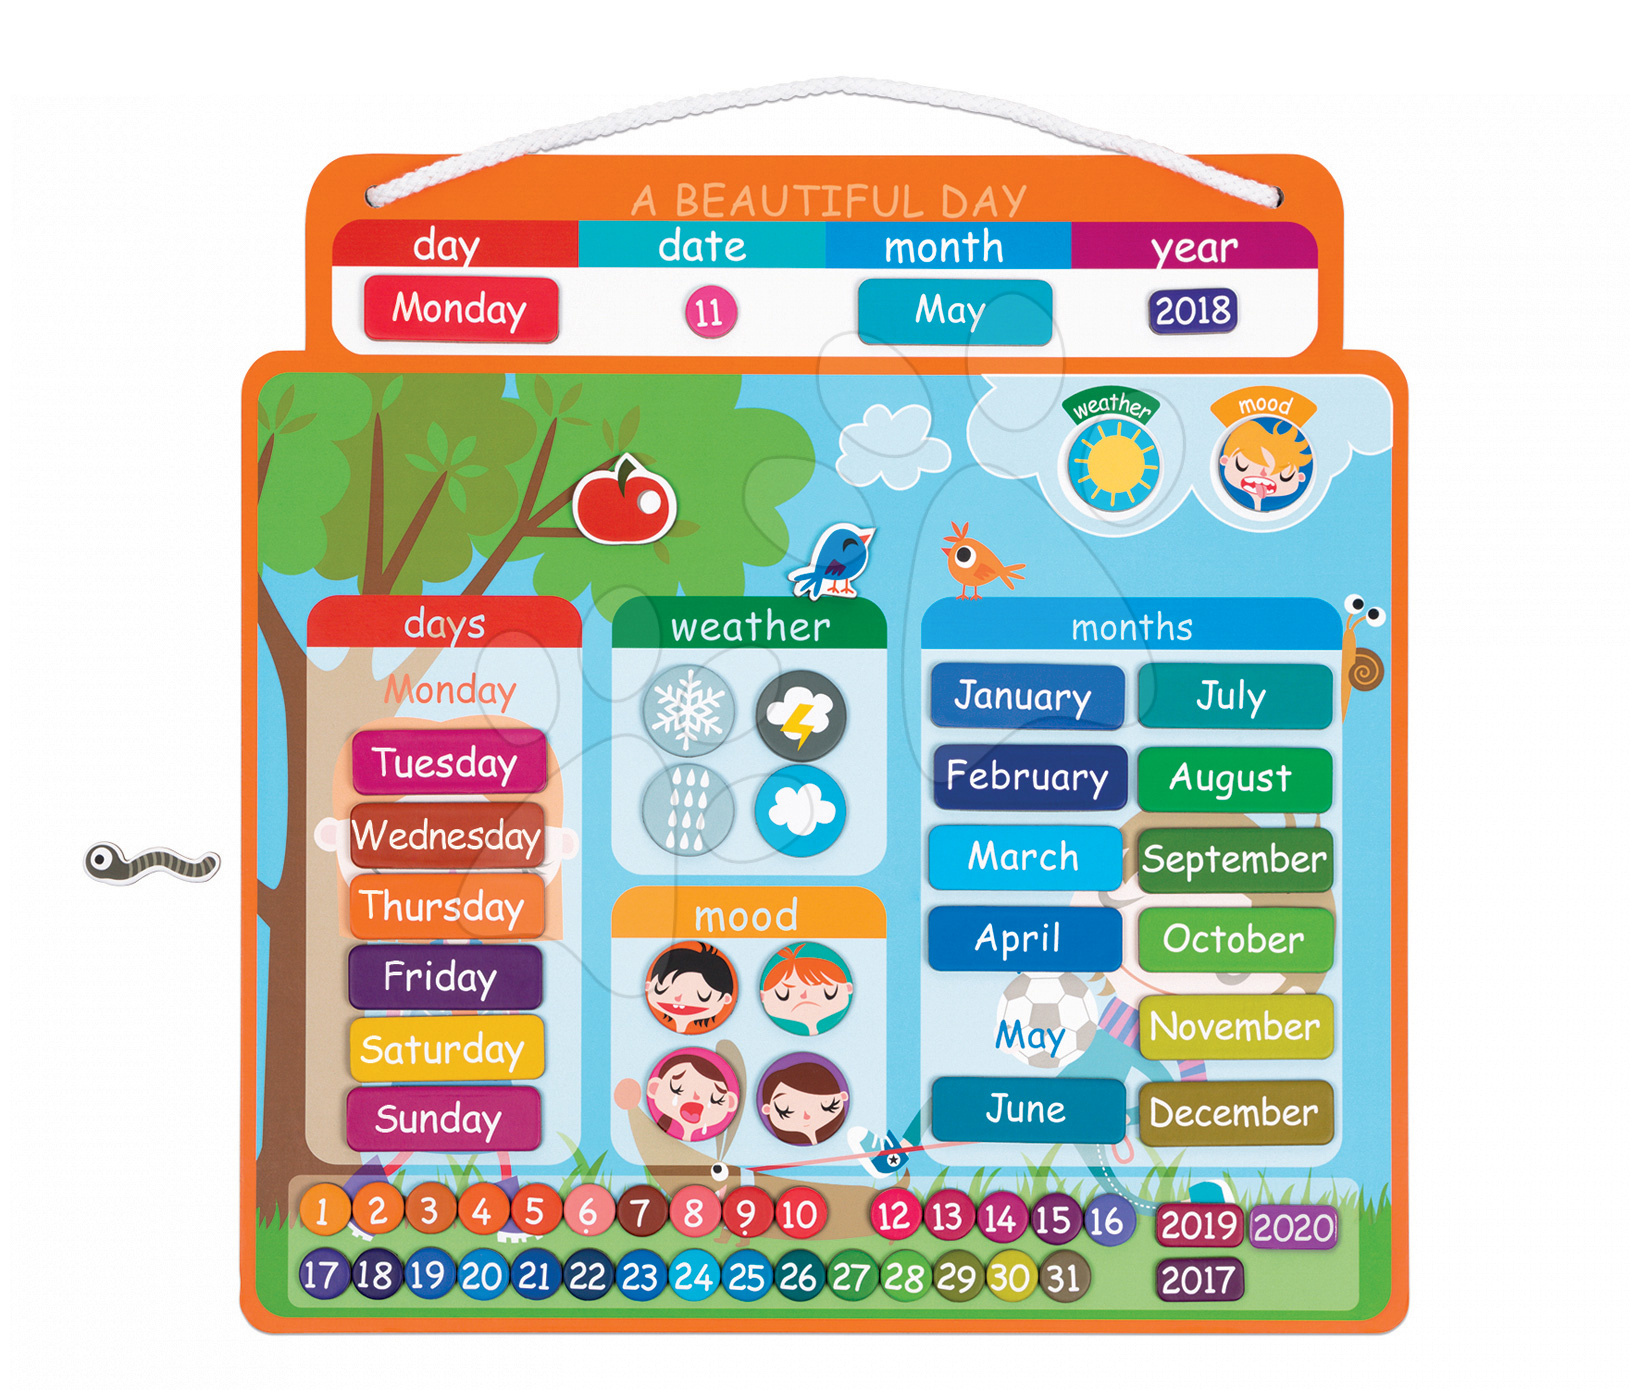 Magnetky pre deti - Magnetická tabuľa Magnetic Calendar - A Beautiful Day Janod v angličtine